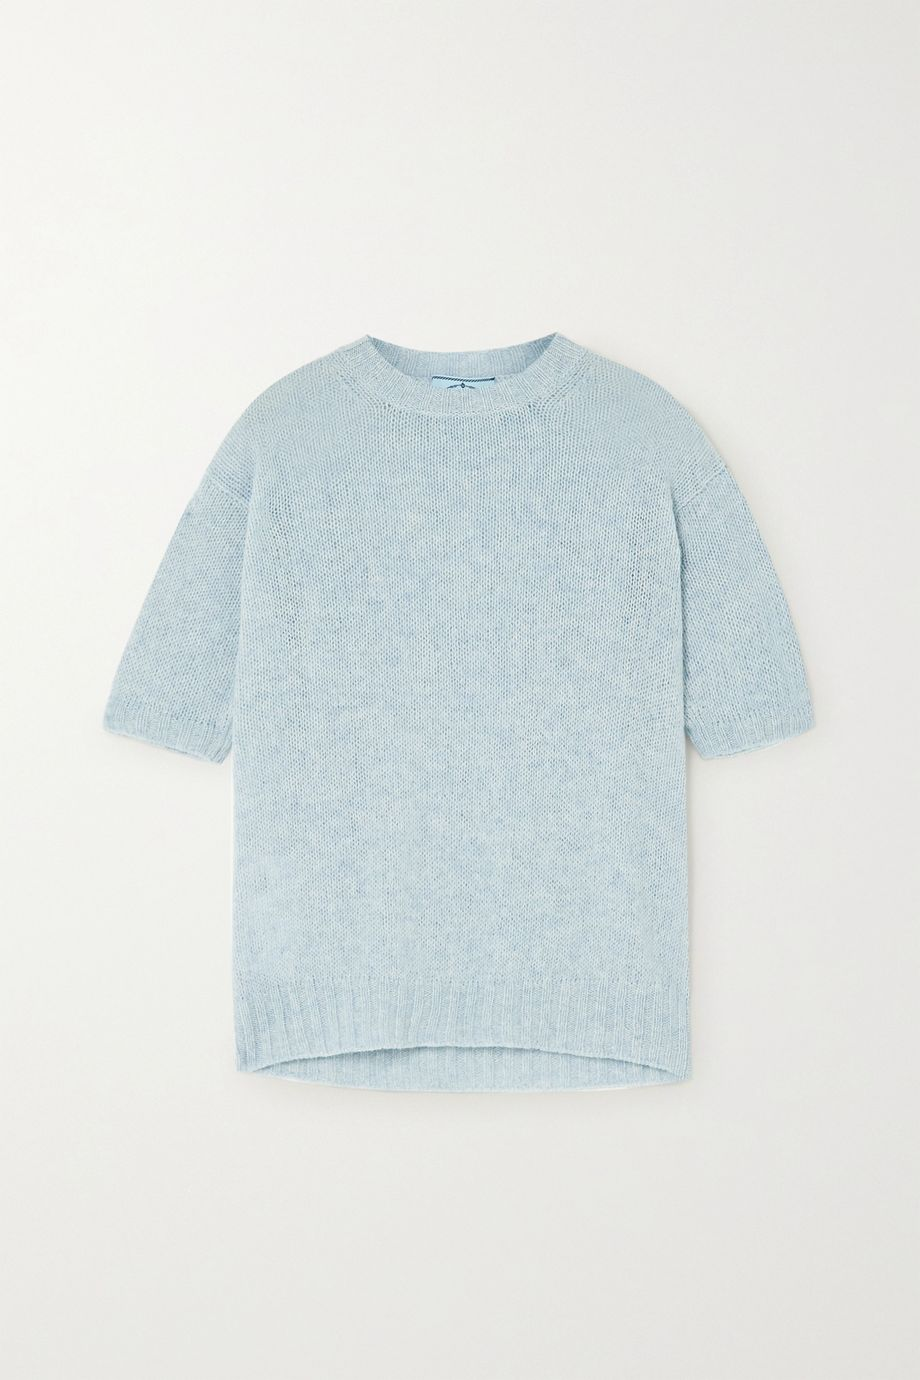 Prada Mélange virgin wool sweater